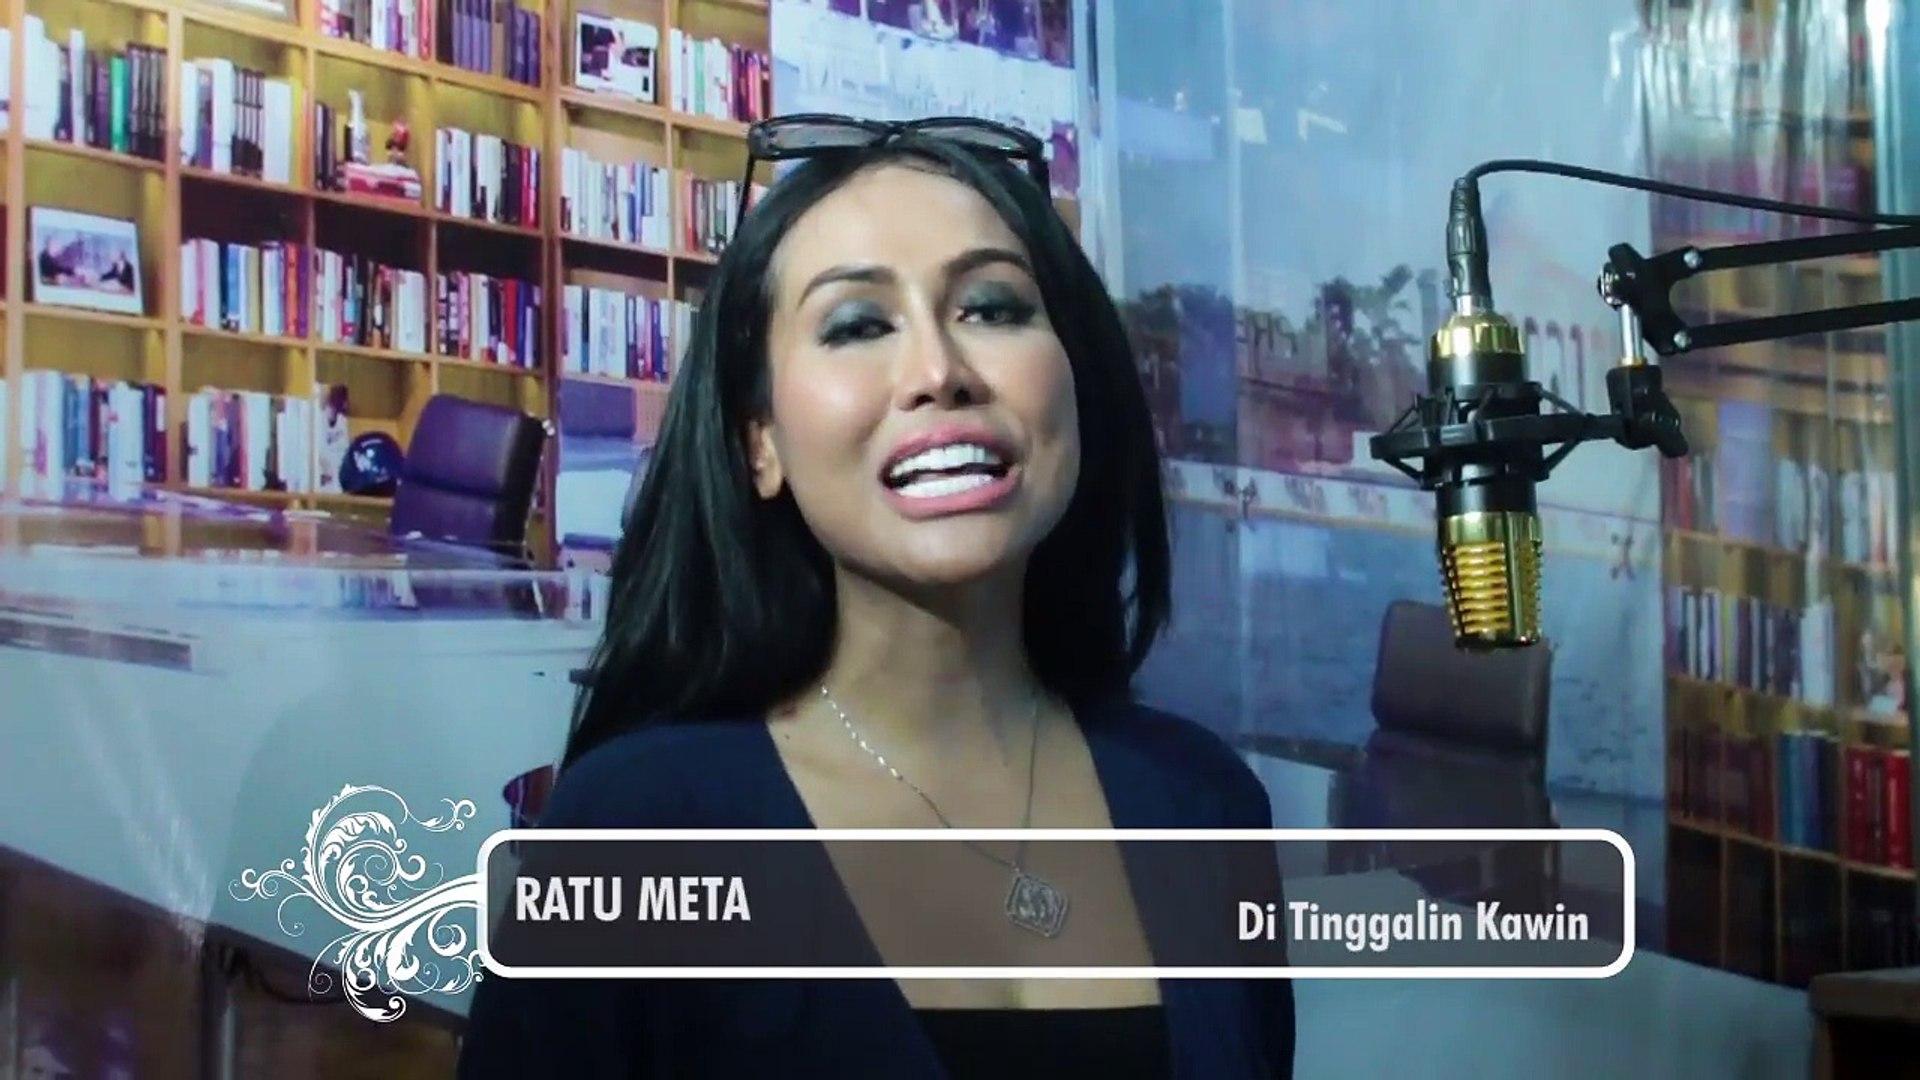 Cover Lagu Di Tinggalin Kawin Ratu Meta Berhadiah Jutaan Rupiah #cover